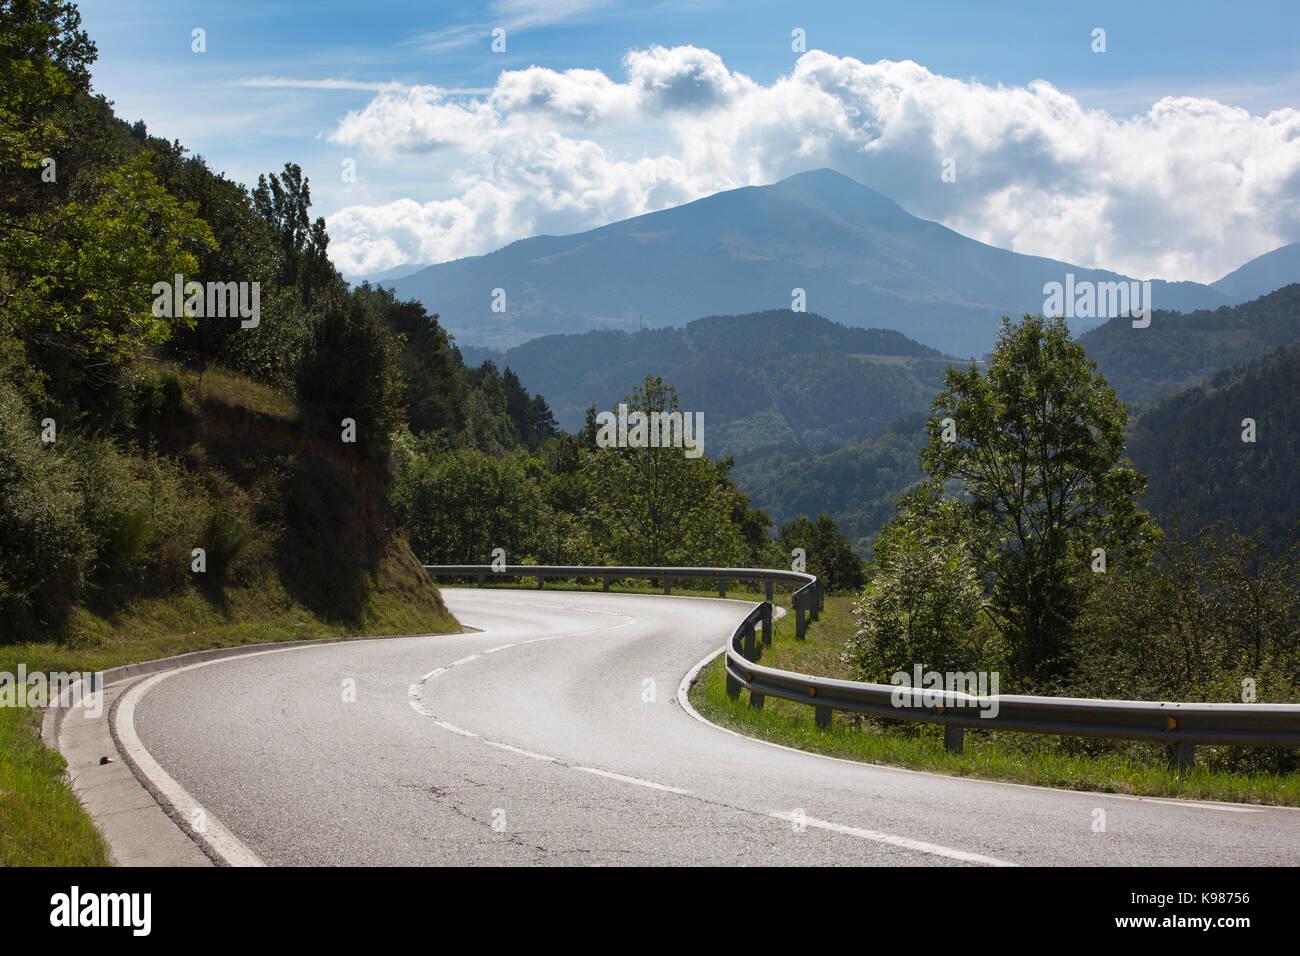 Tena Valley within the Aragonese Pyrenees mountain range, Catalan Pyrenees, Spain, Europe - Stock Image